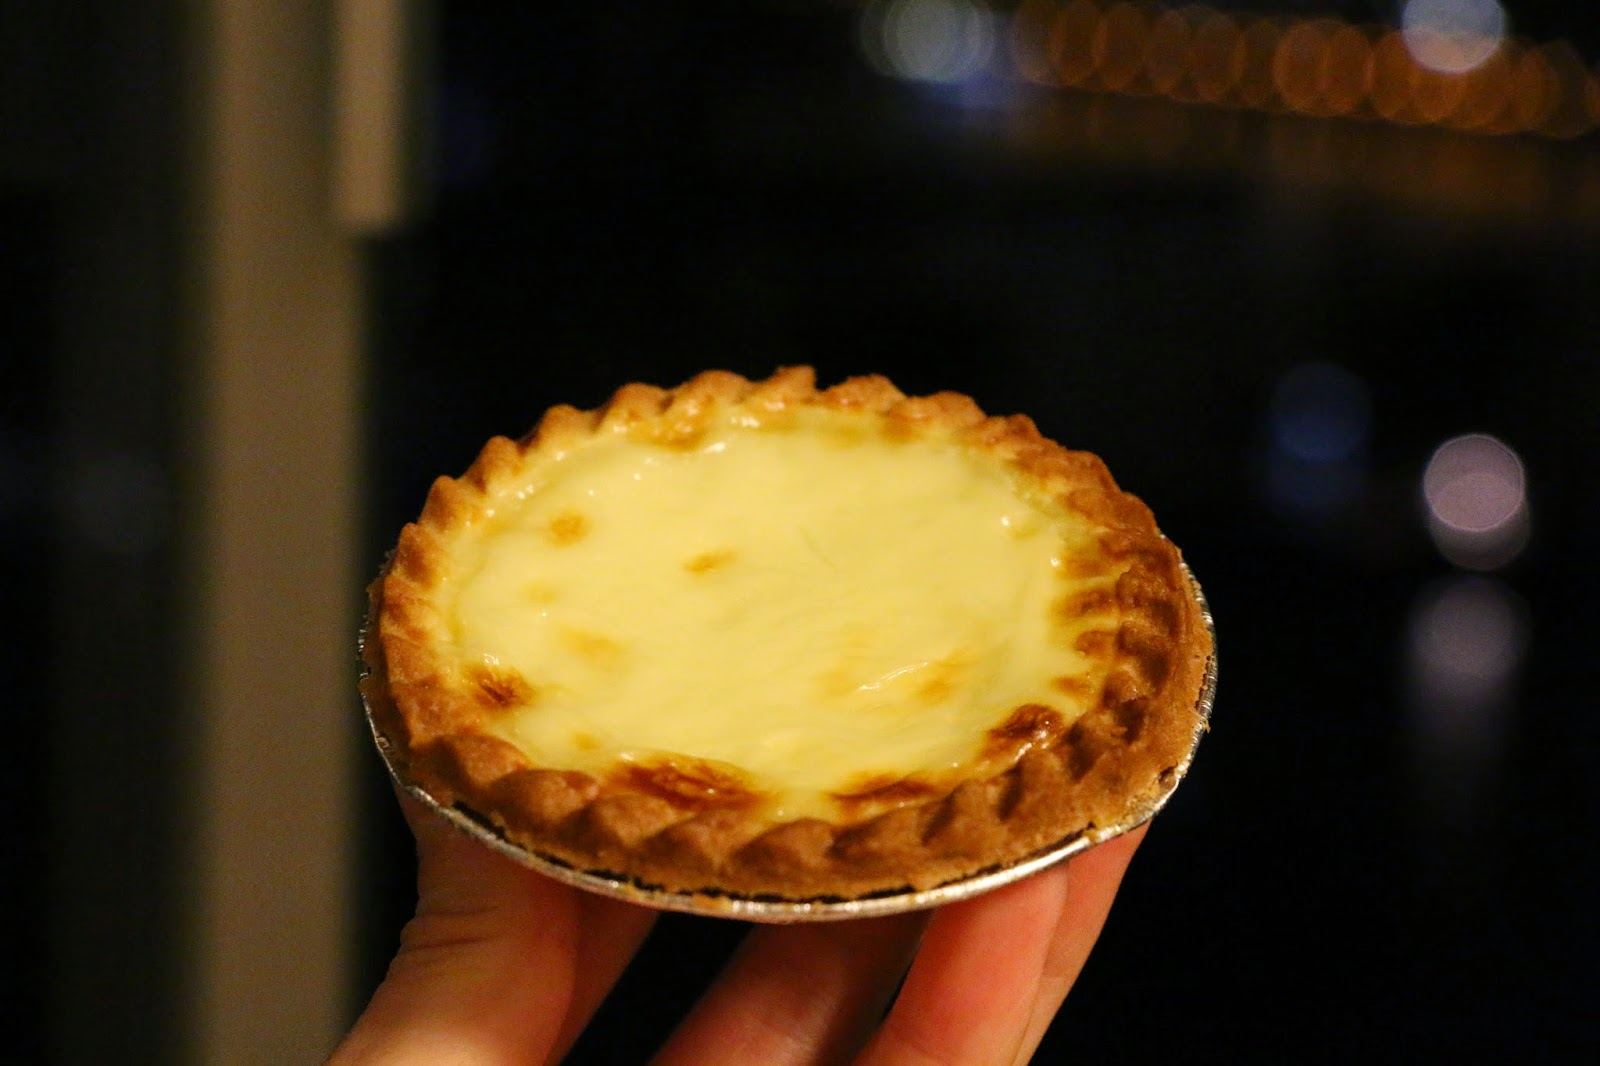 arome bakery, hokkaido milk egg tart, Spot The Food